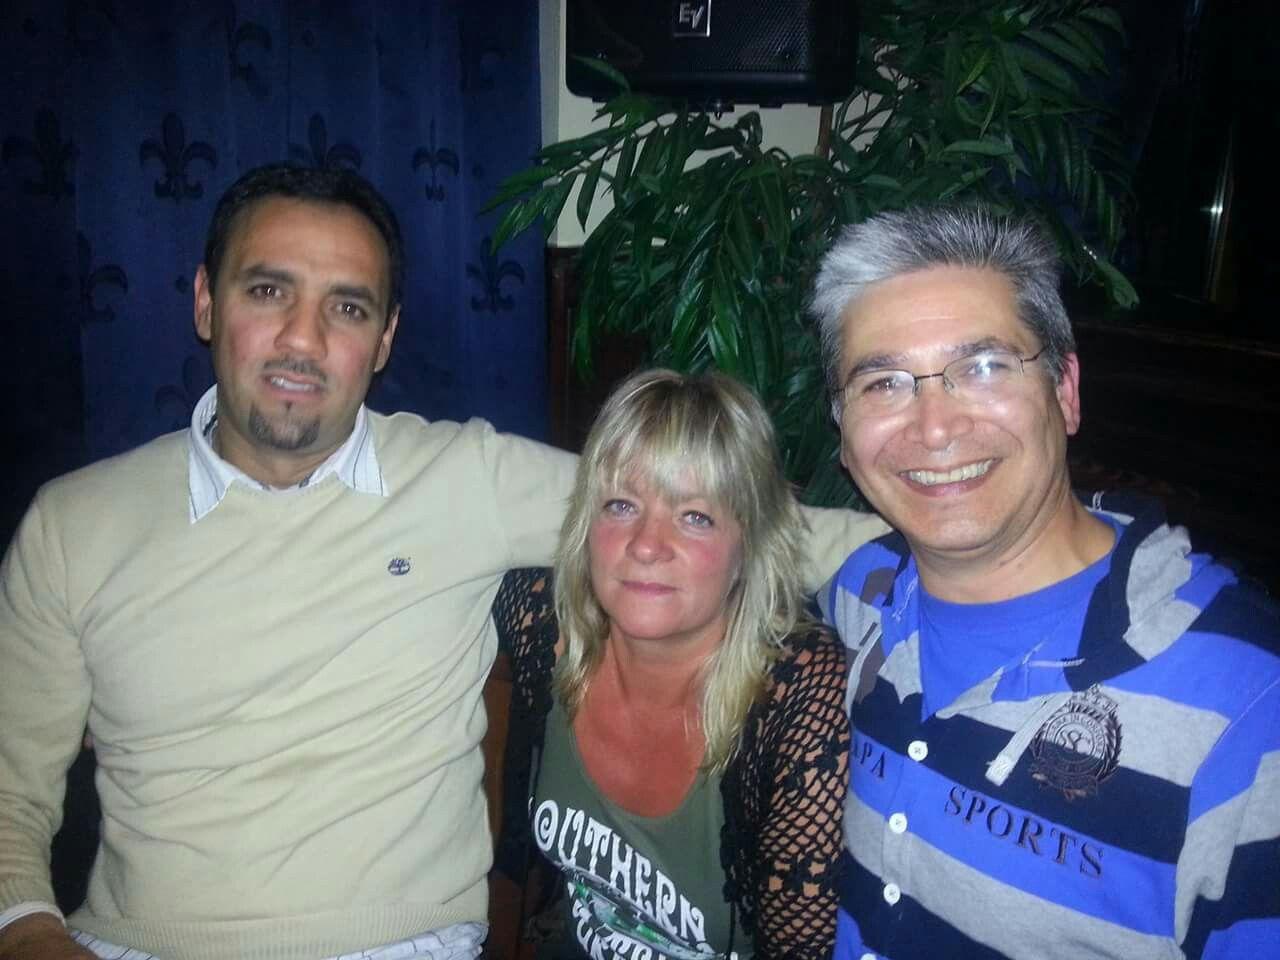 Collega s De Faam Breda